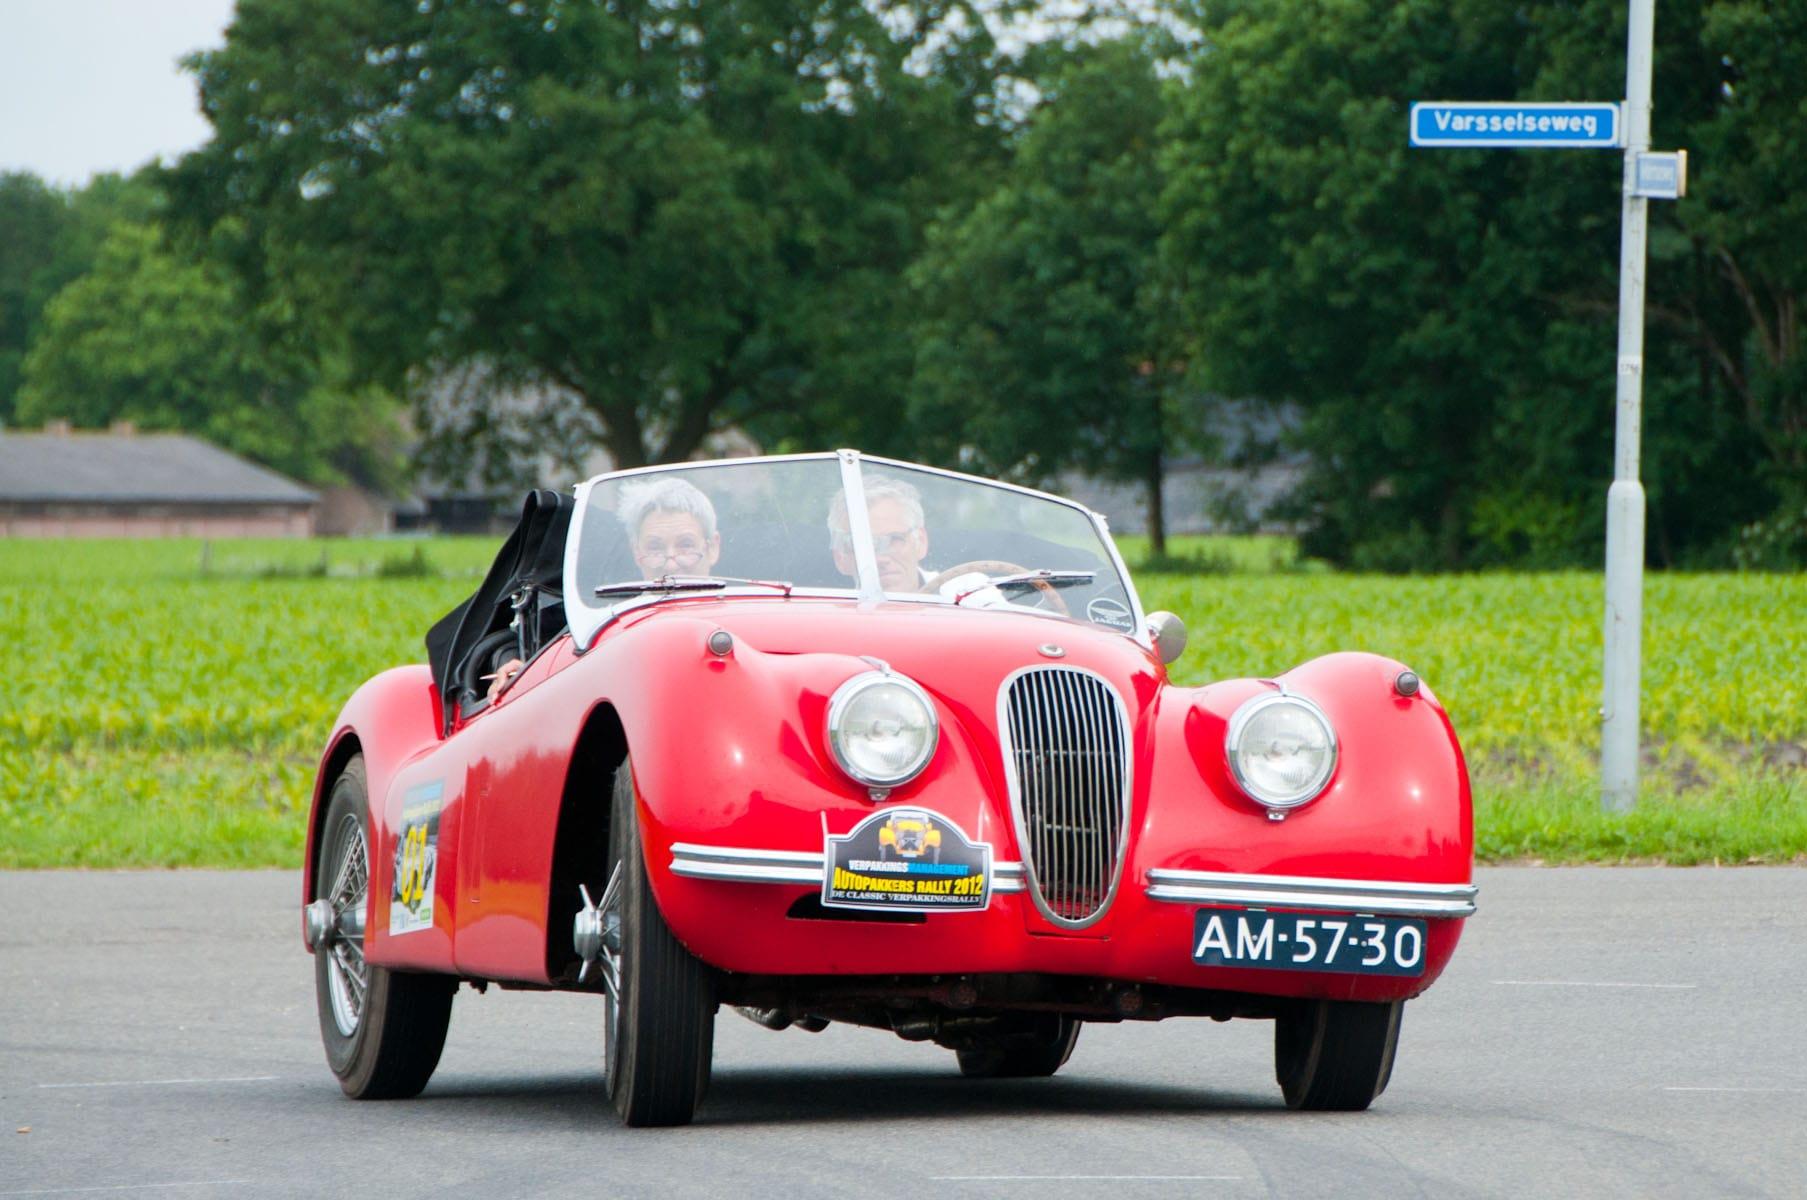 Piet rode auto